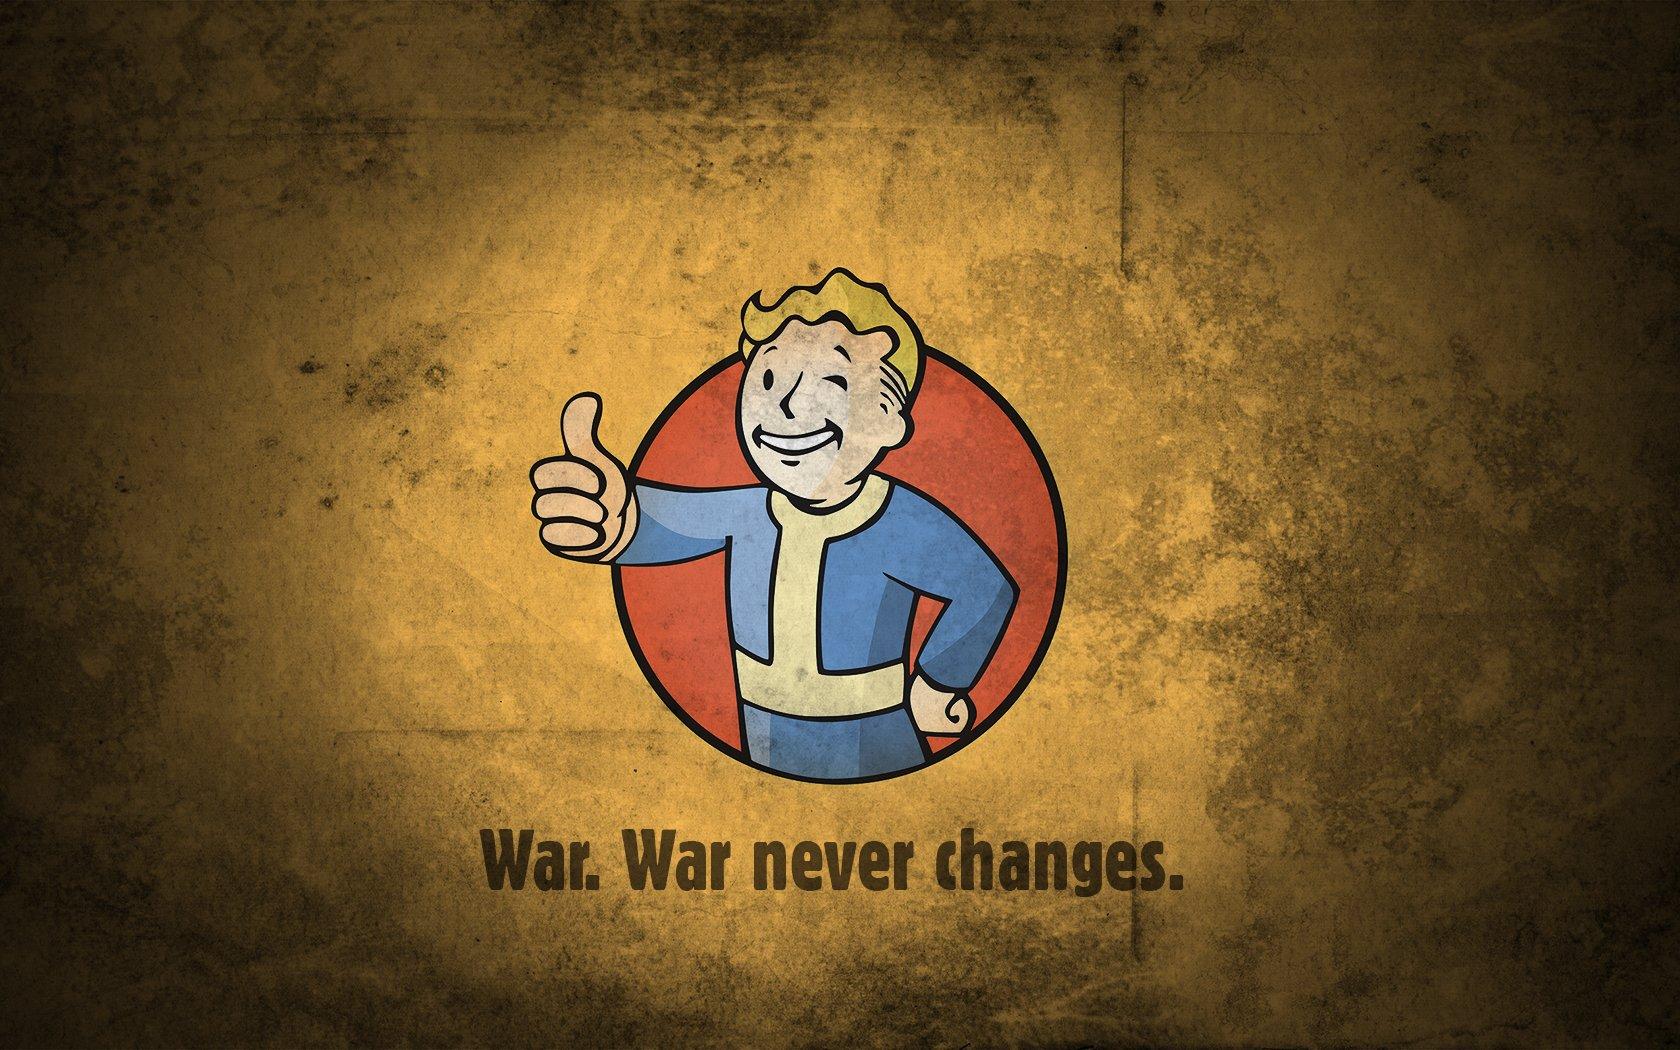 Fall Out Boy Wallpaper Iphone 6 Fallout Vault Boy War Never Changes Wallpaper And